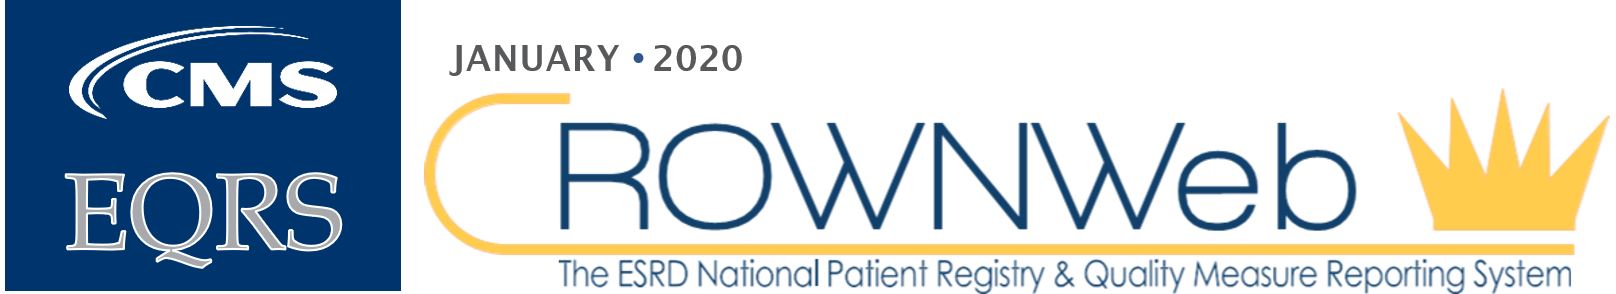 January 2020 CROWNWeb News